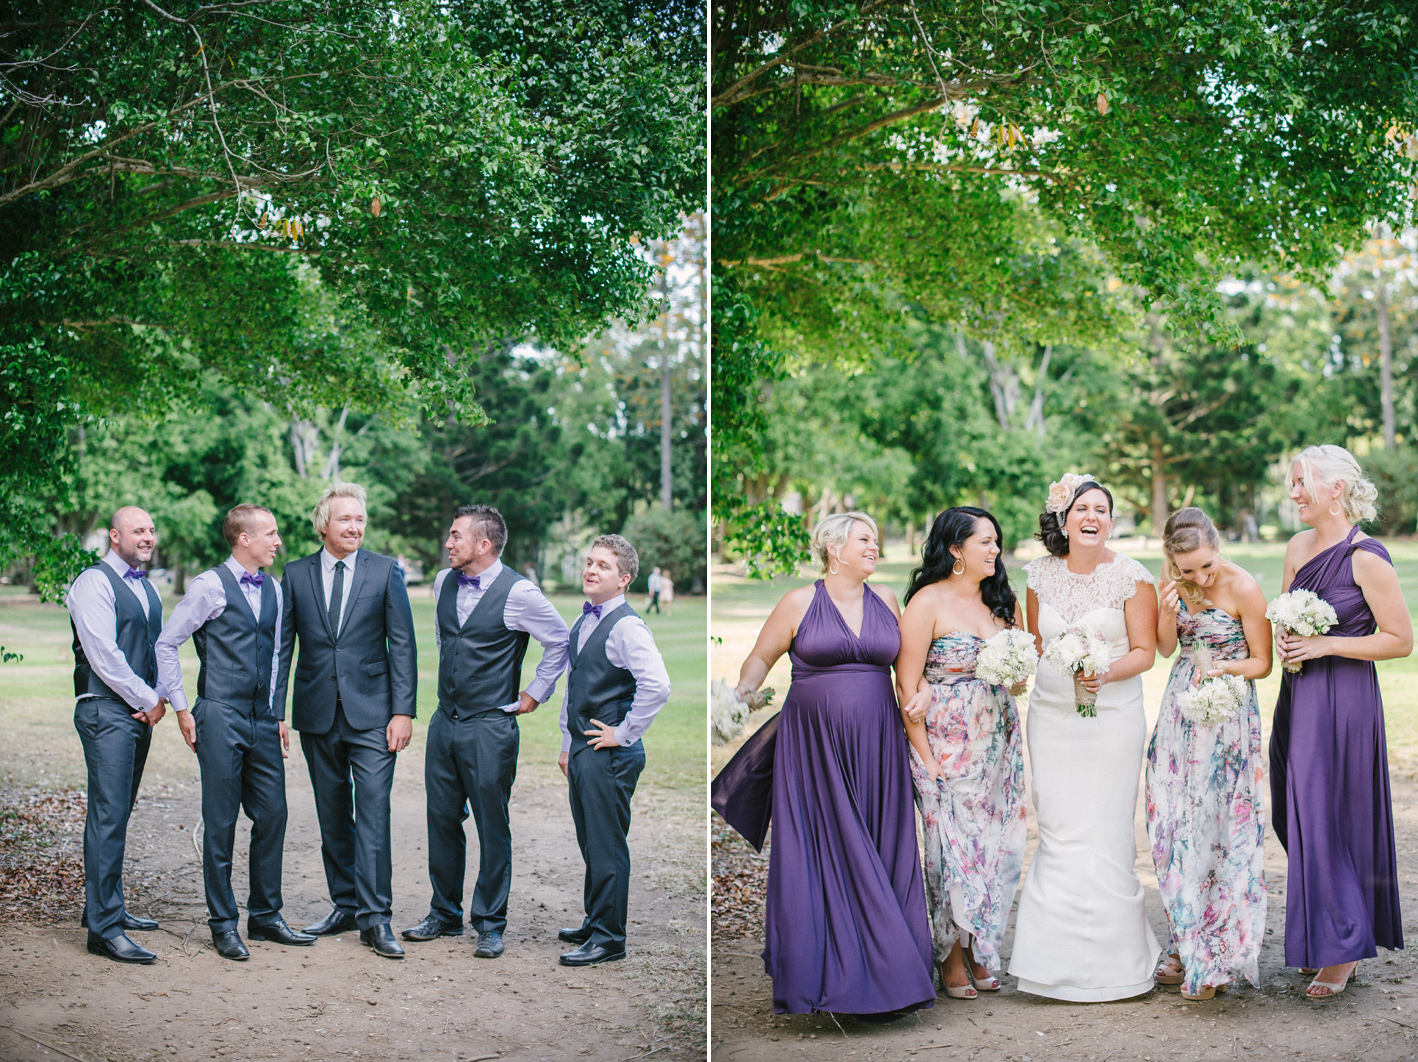 057-hannah-daniel-boomerang-farm-wedding-sophie-baker-photography